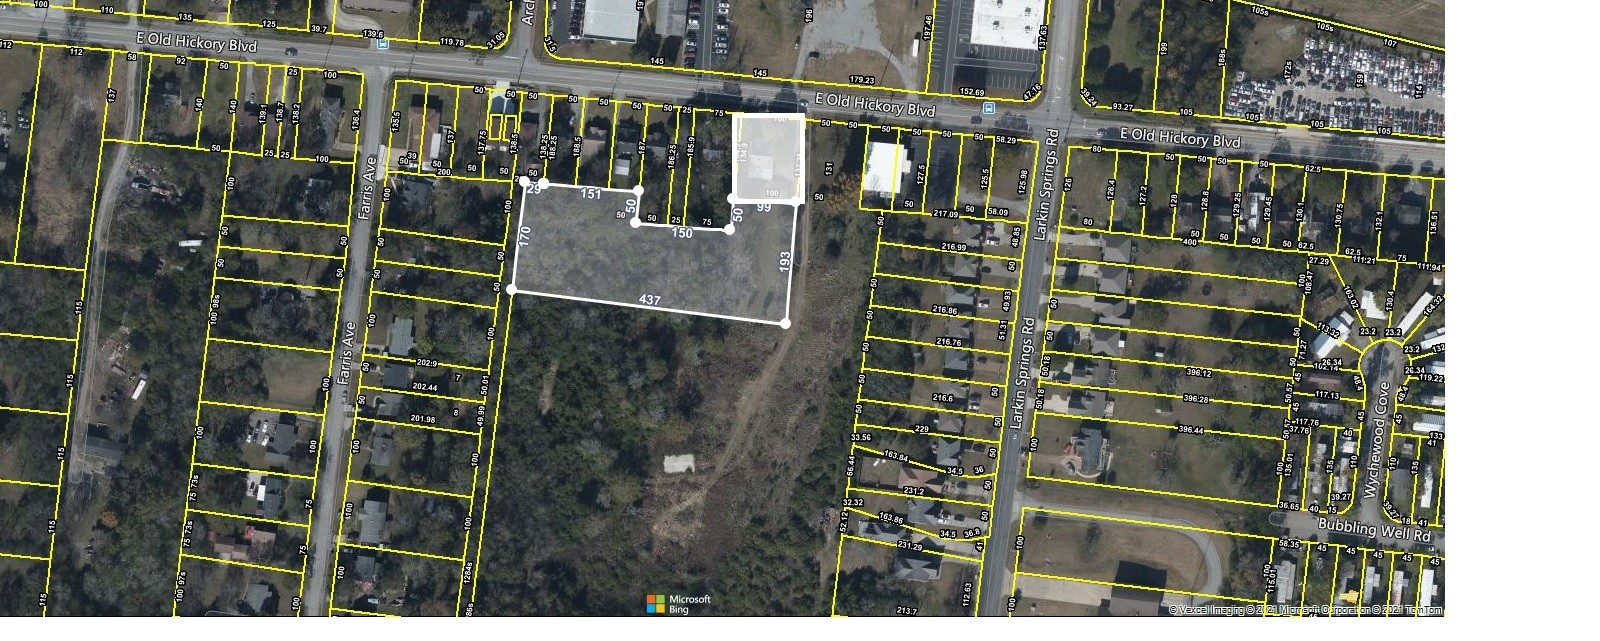 1018 E Old Hickory Blvd Property Photo - Madison, TN real estate listing